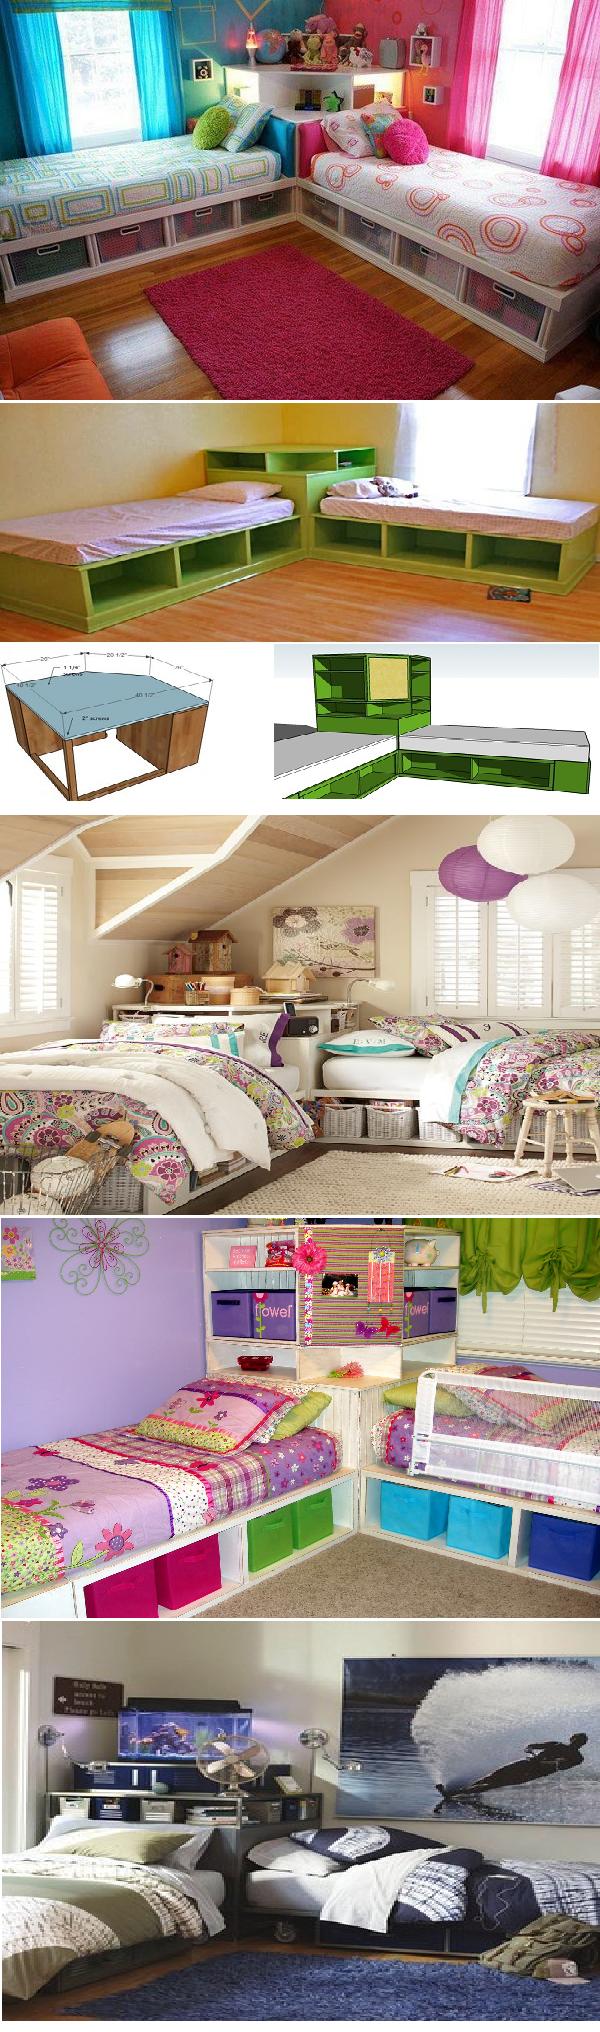 Diy Twin Corner Beds With Storage Girl Room Corner Twin Beds